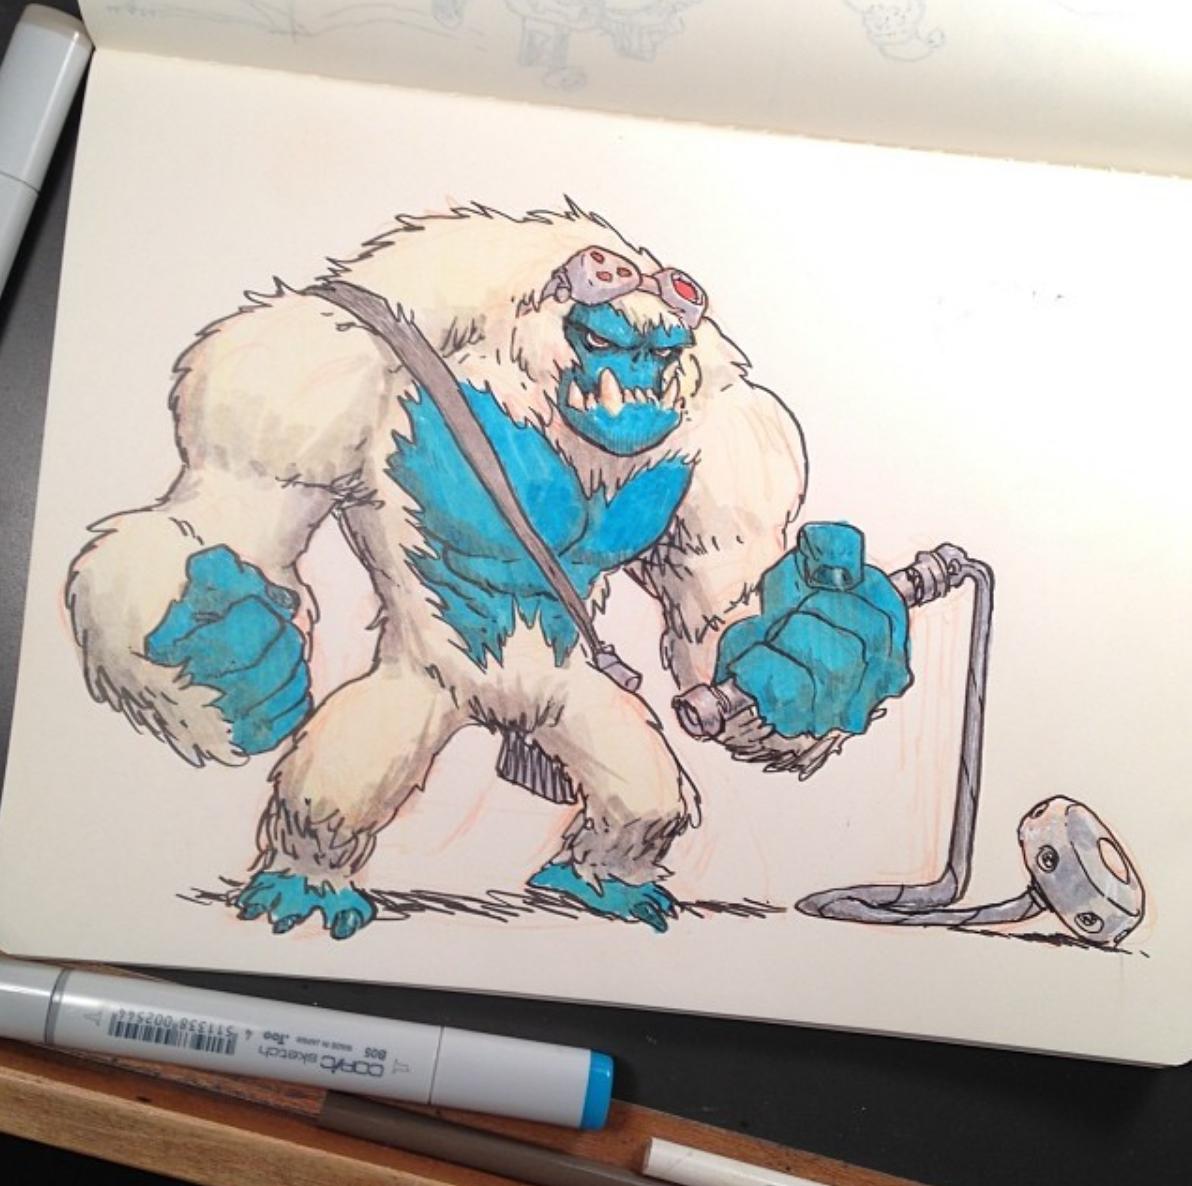 Misunderstood monster….needs a hug. Art by Jake Parker!